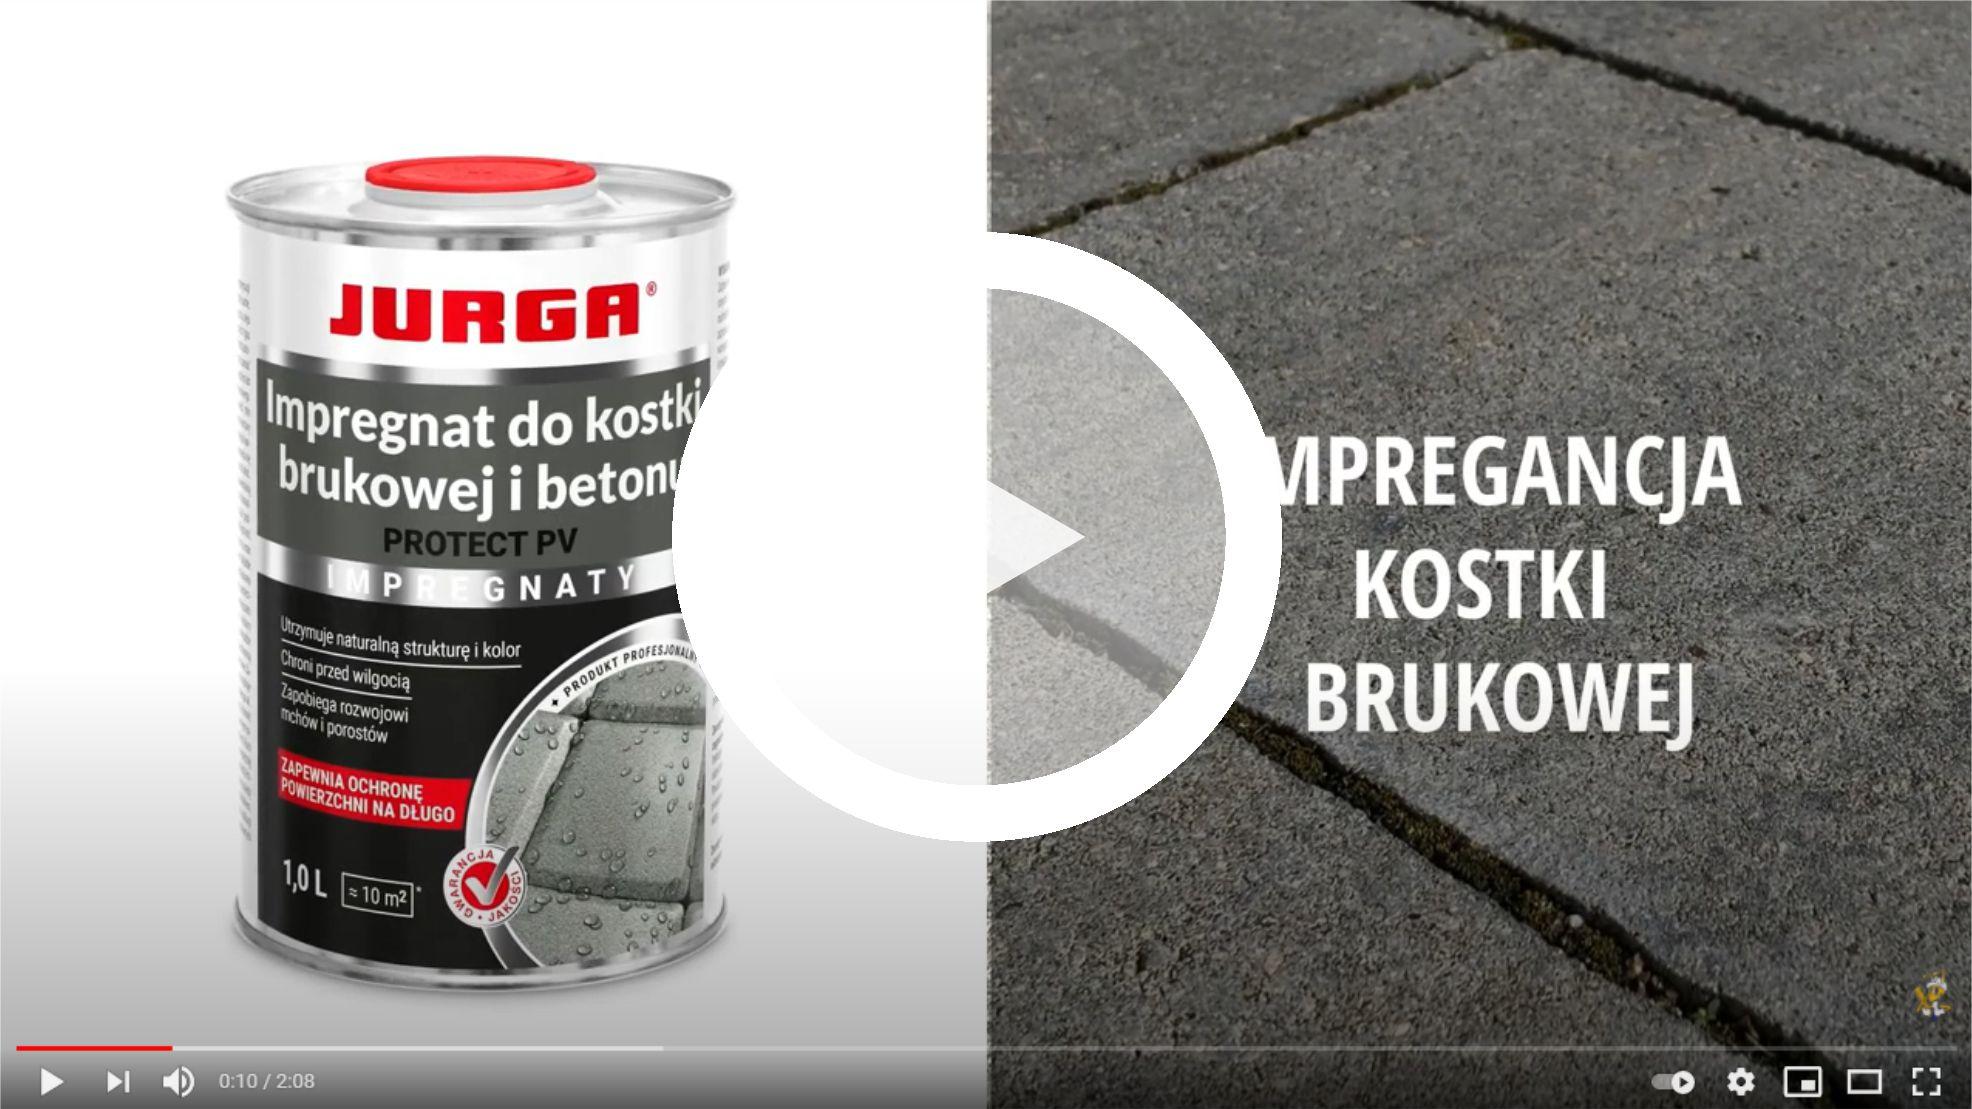 twoja-kostka-stracila-blask-jurga-protect-pv